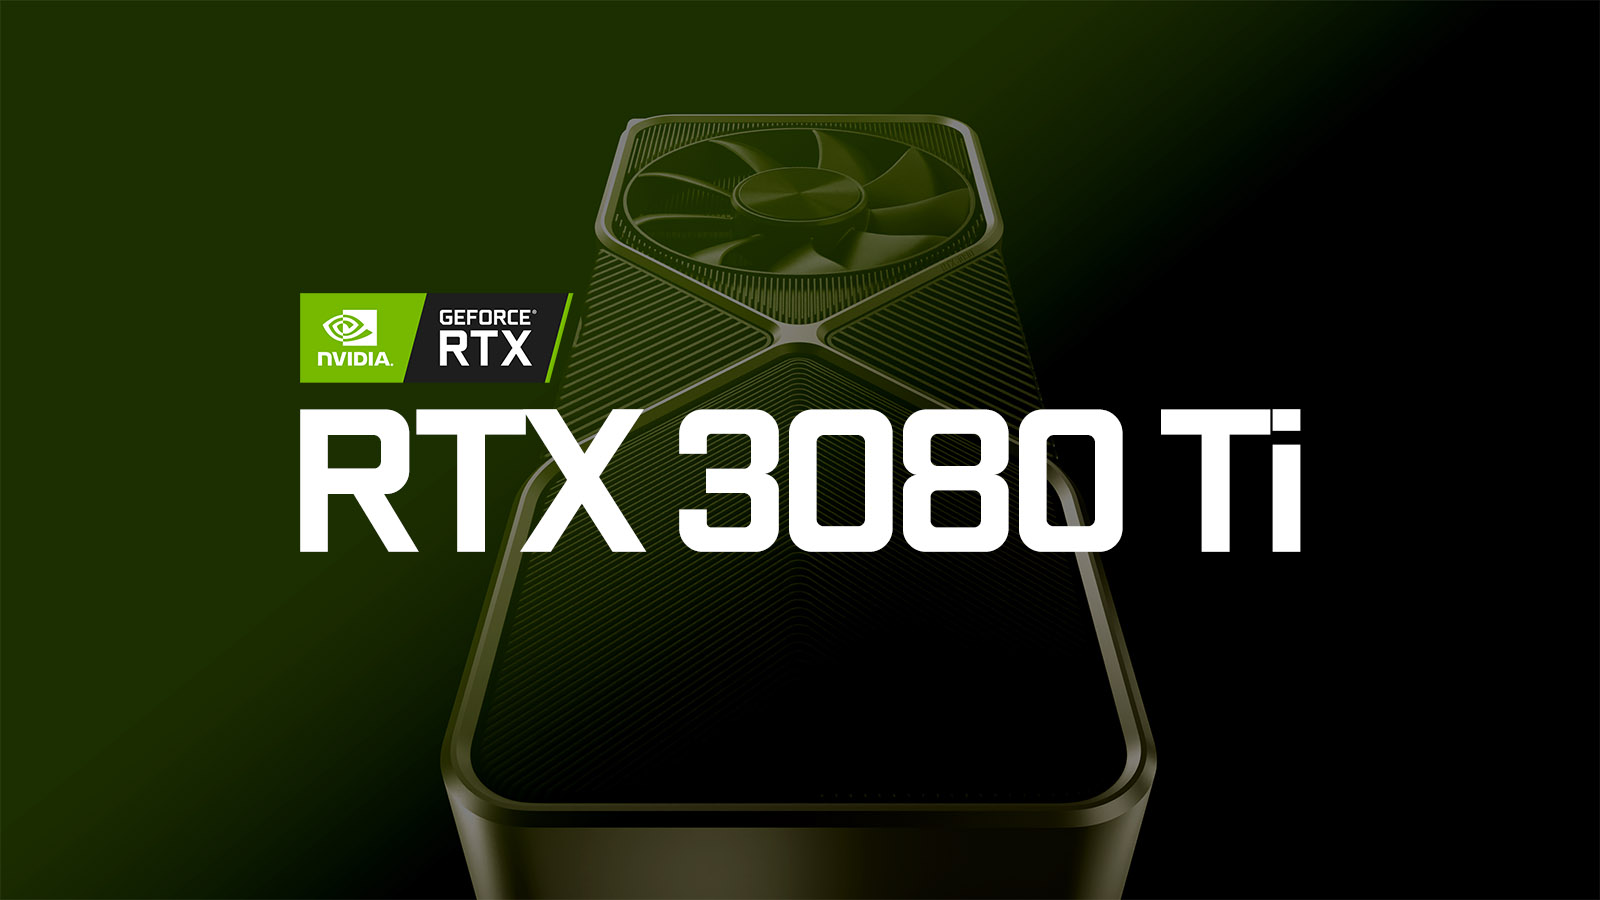 NVIDIA Releases RTX 3080 Ti and RTX 3070 Ti gaming GPUs